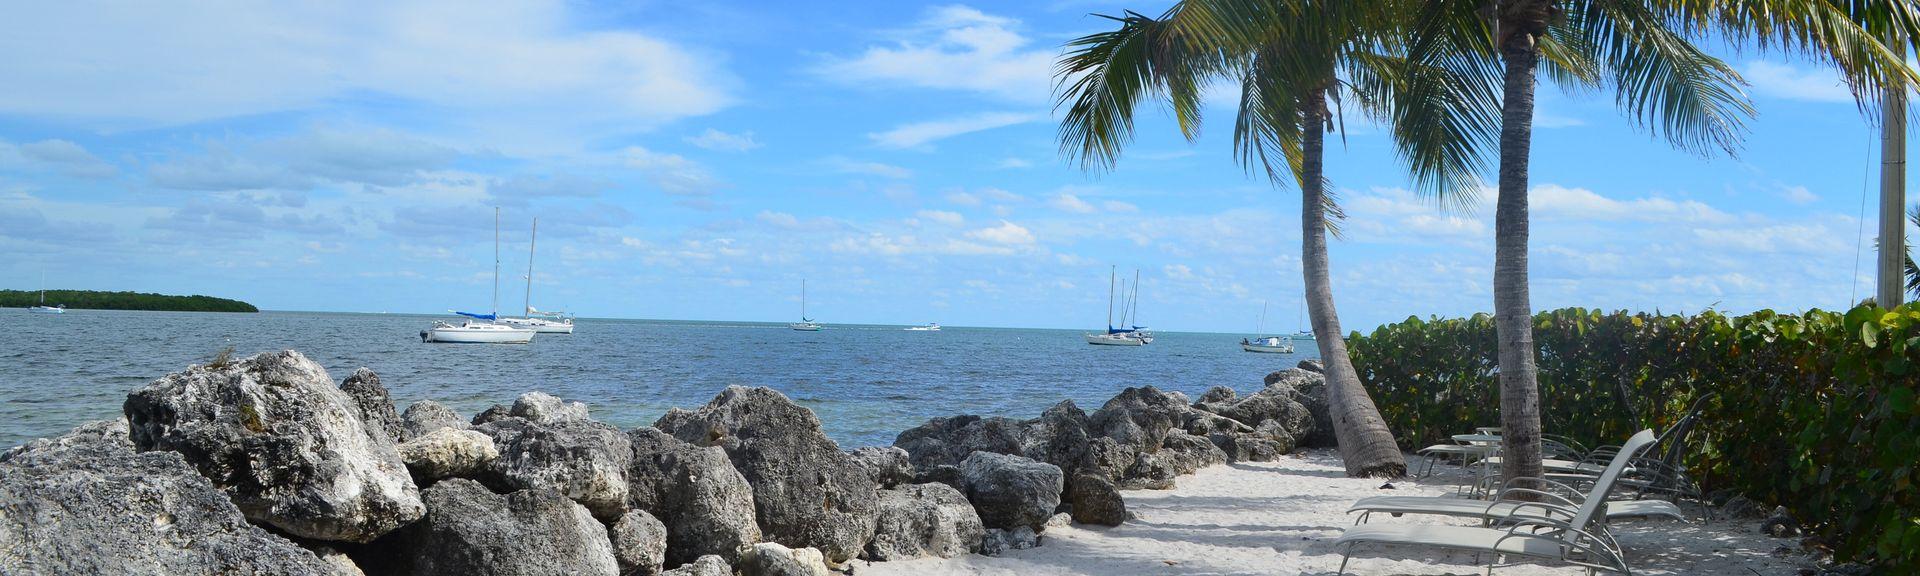 Mariners Club, Key Largo, FL, USA